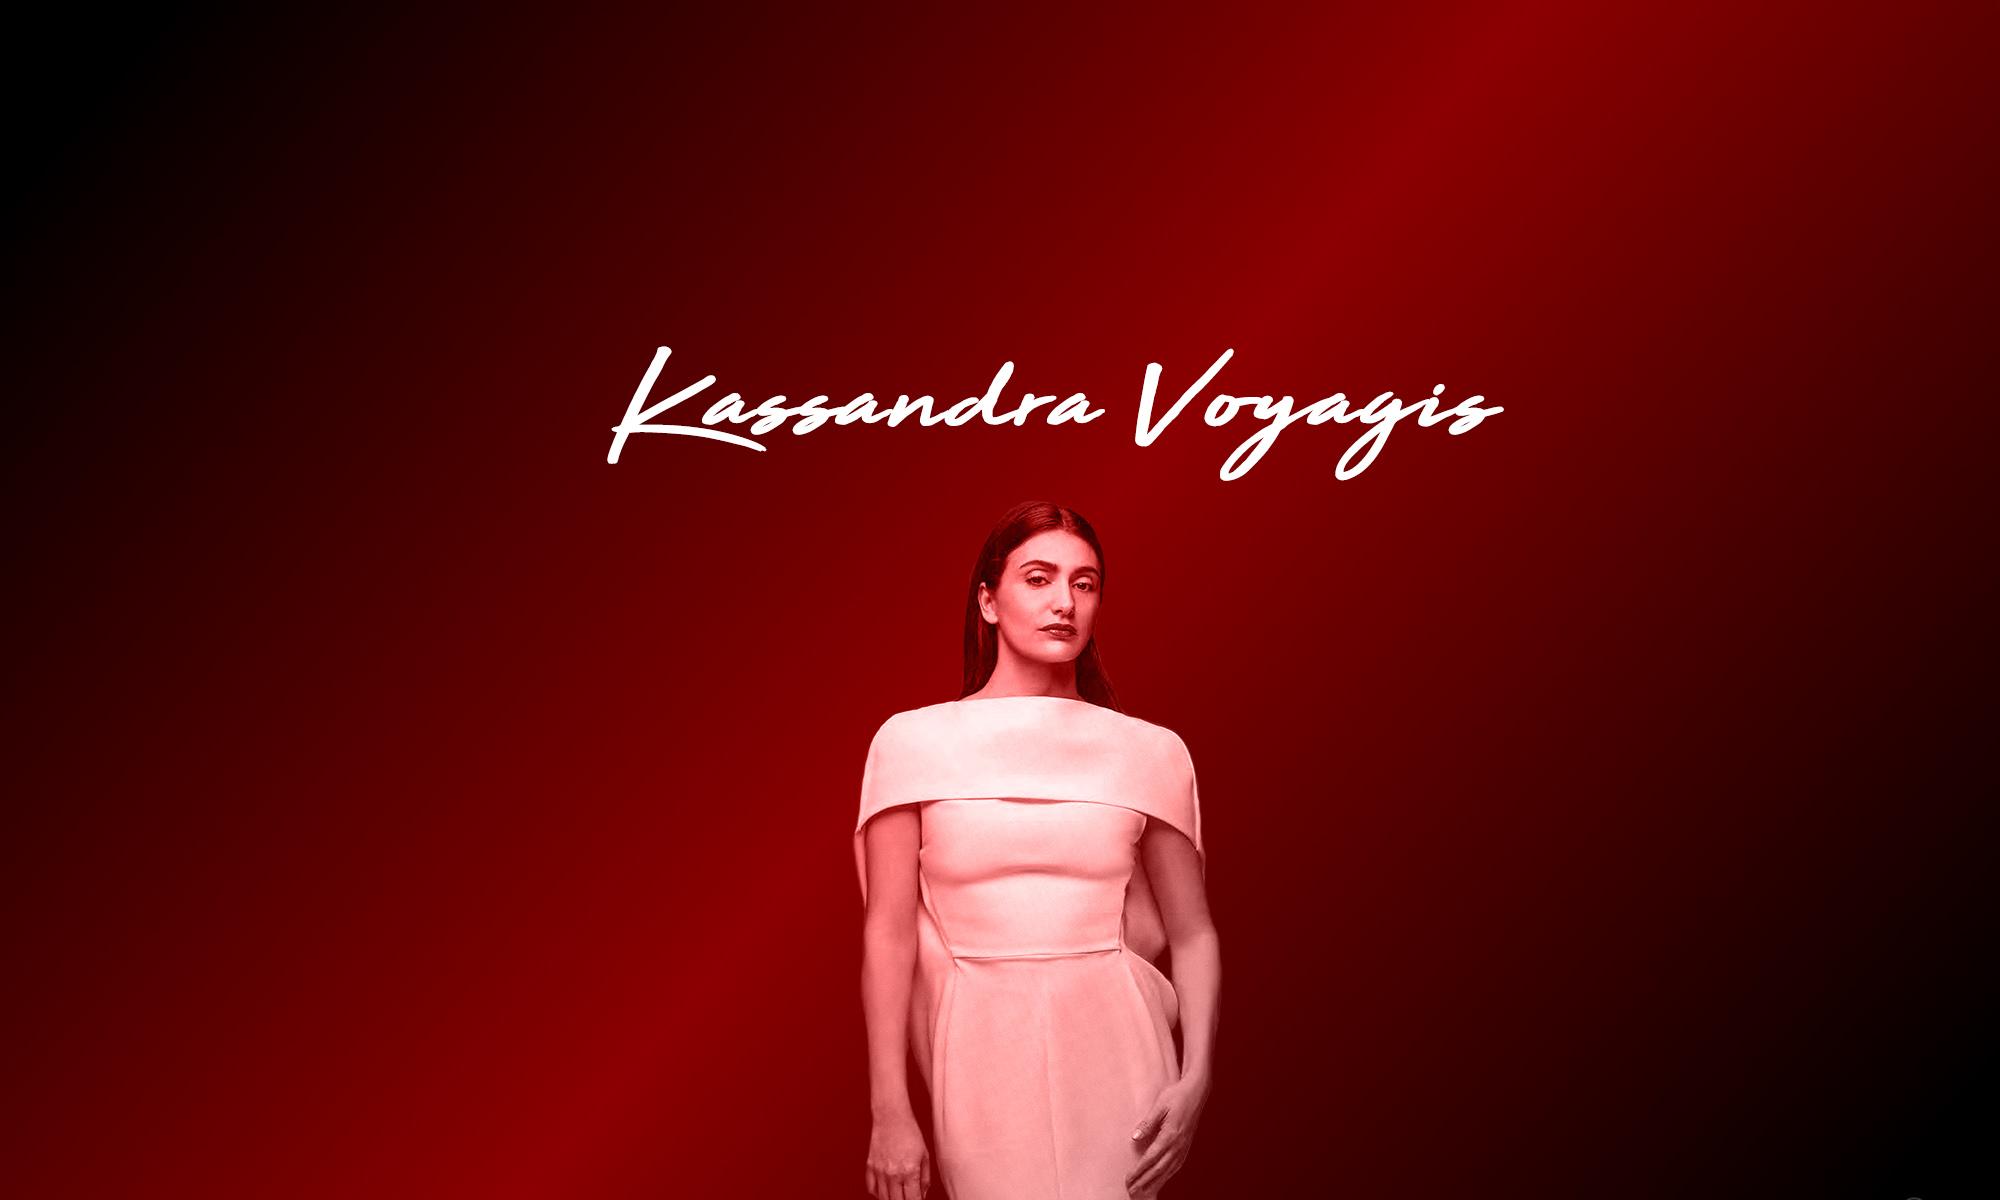 kassandra voyagis offical home page, kassandravoyagis, kassandravoyagis.com, kassandra voyagis actress, italian actress, greece actress